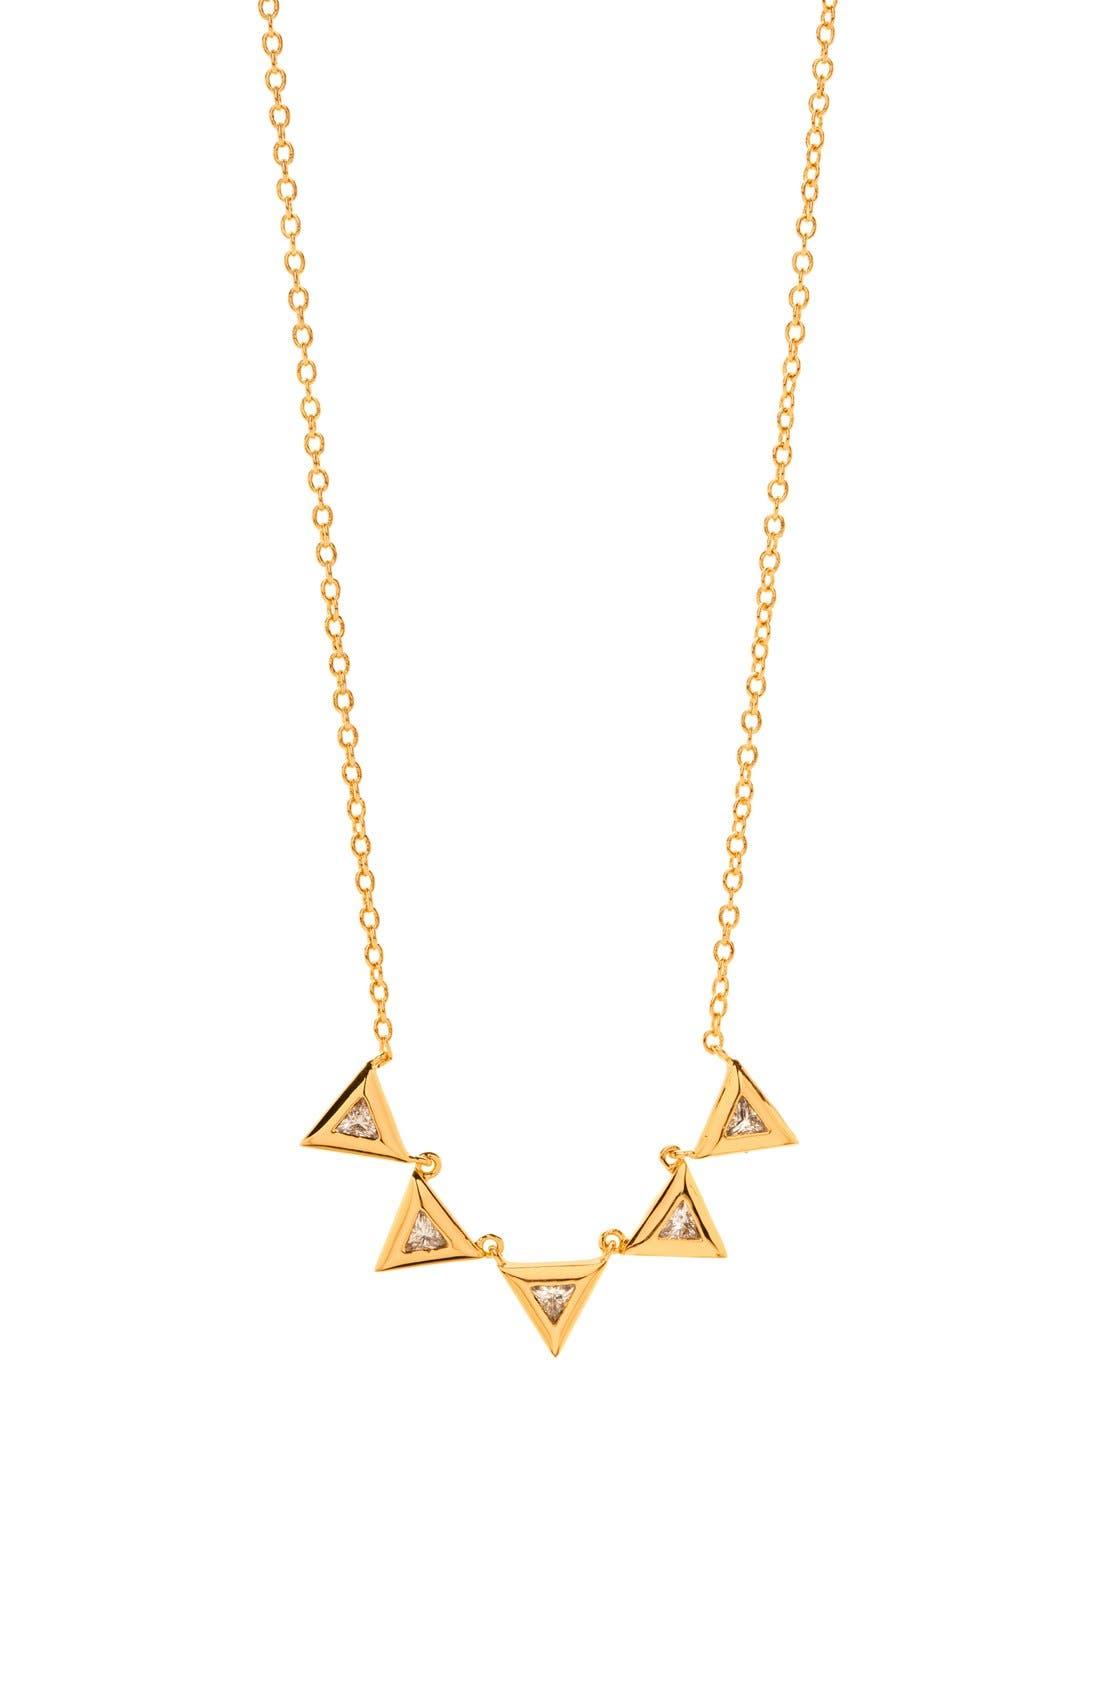 Main Image - gorjana 'Vivienne' Pendant Necklace